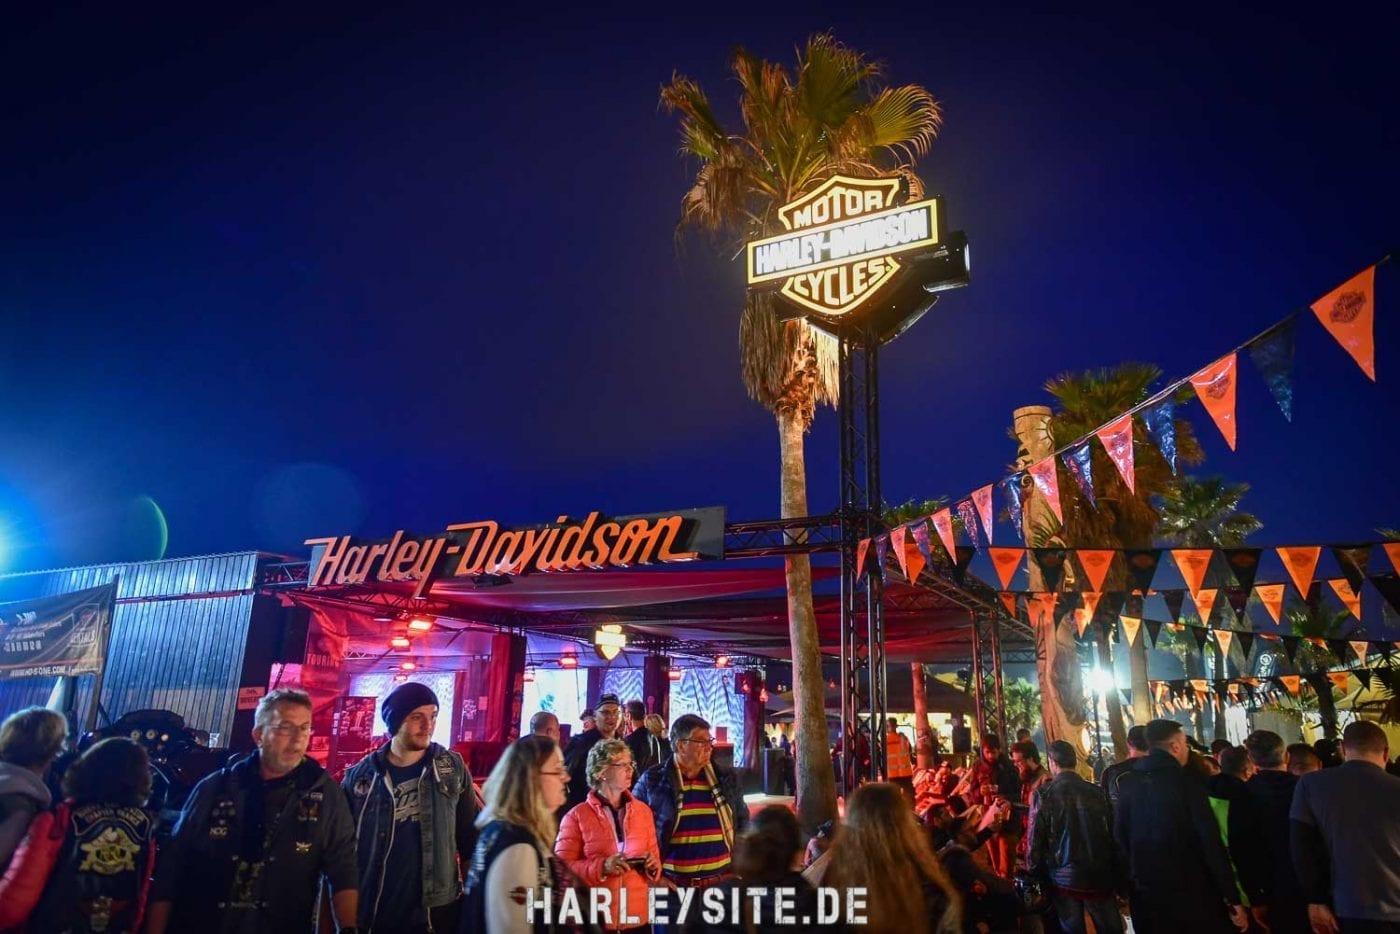 Saint Tropez Harley-Davidson Event